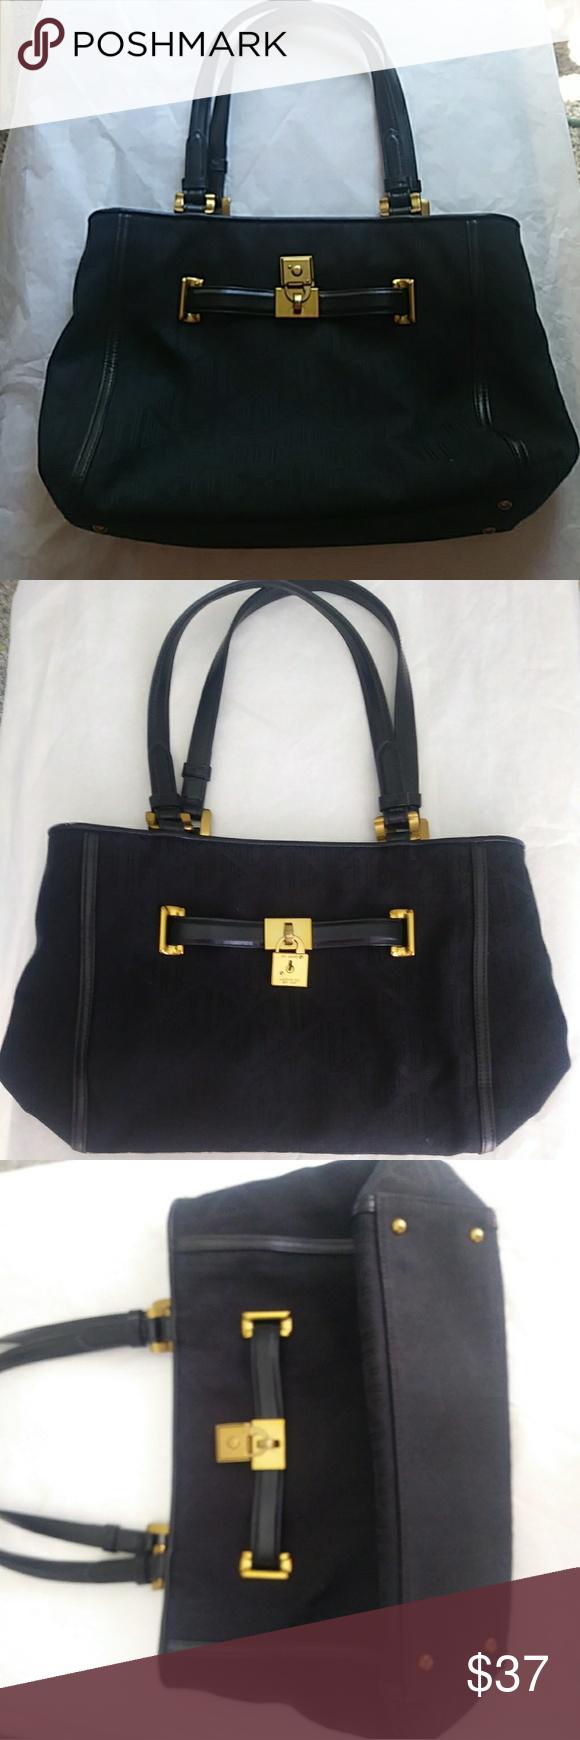 c99ed9d498f Ralph Lauren Hobo purse Ralph Lauren Black hobo in Great condition. Perfect  for any outfit. Ralph Lauren Bags Hobos